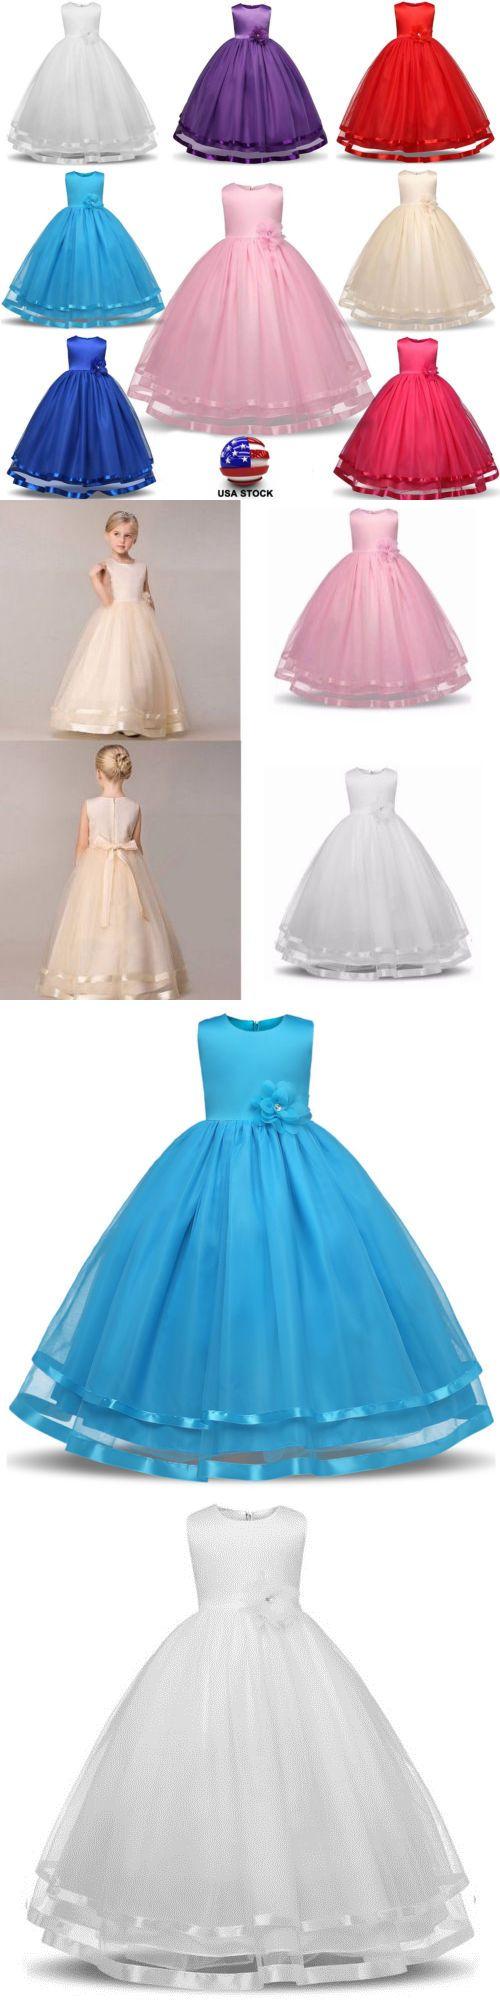 Girls kids floral princess formal wedding bridesmaid gown long dress